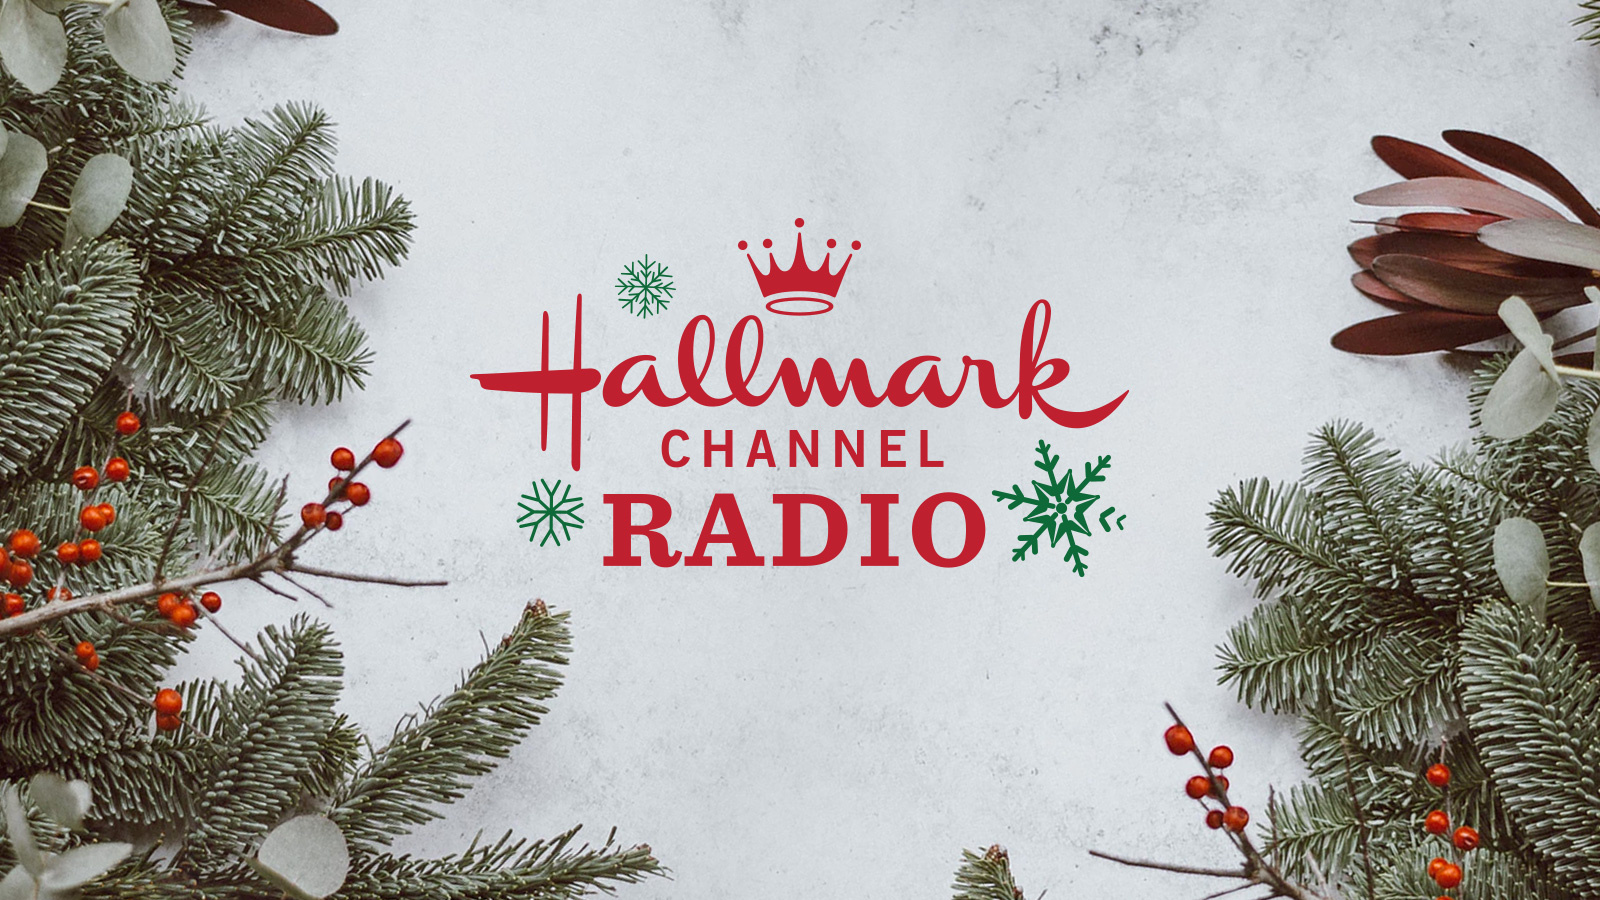 Siriusxm Christmas 2019.Hallmark Channel And Siriusxm Kick Off Countdown To